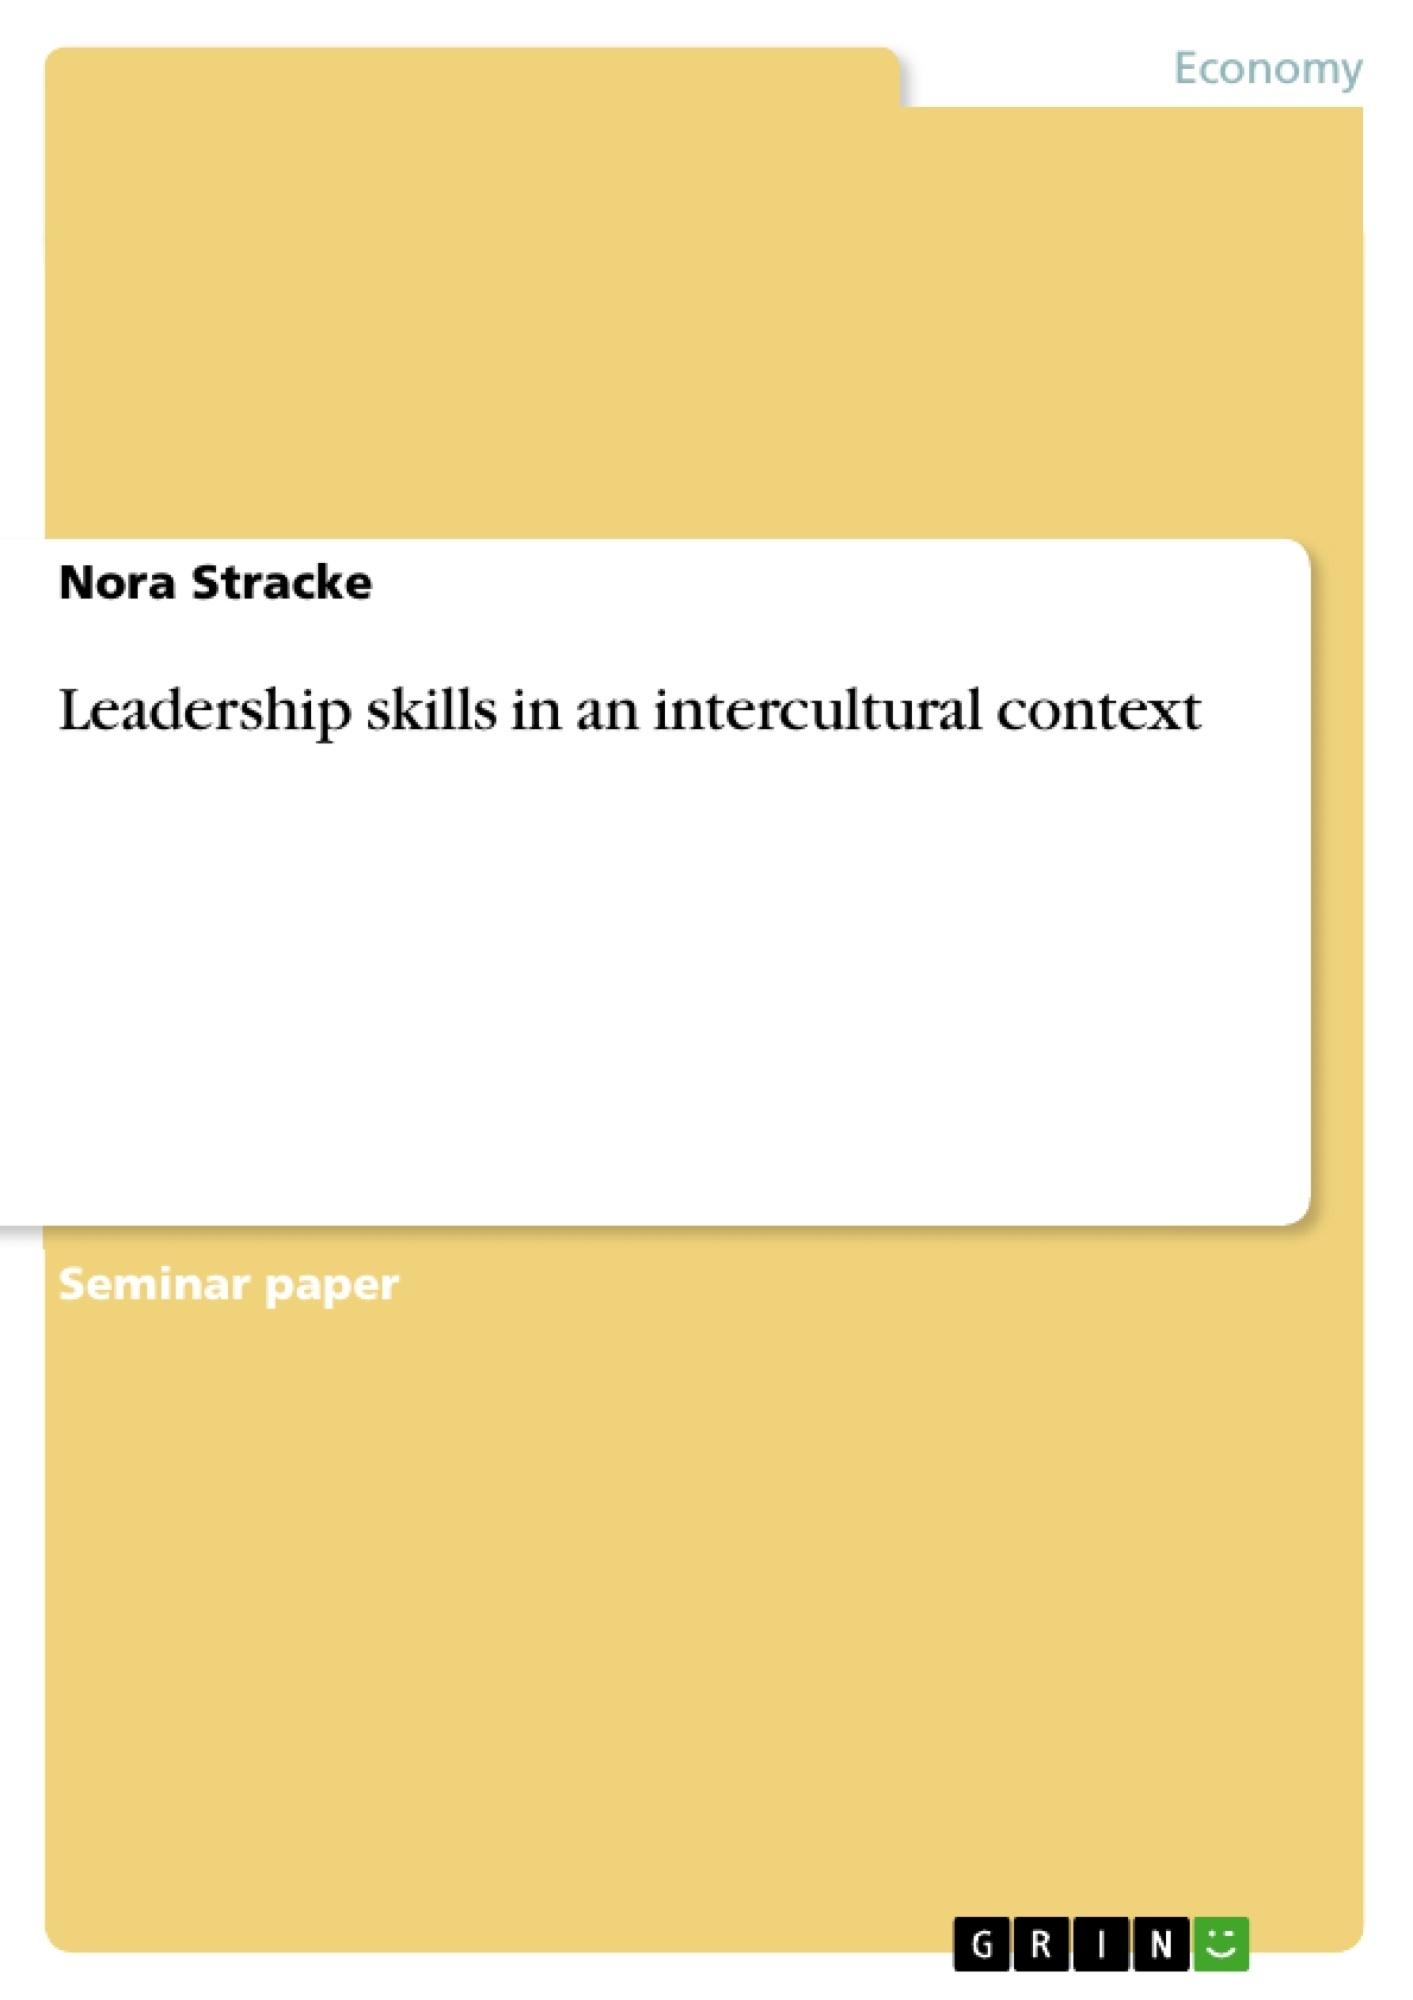 Title: Leadership skills in an intercultural context